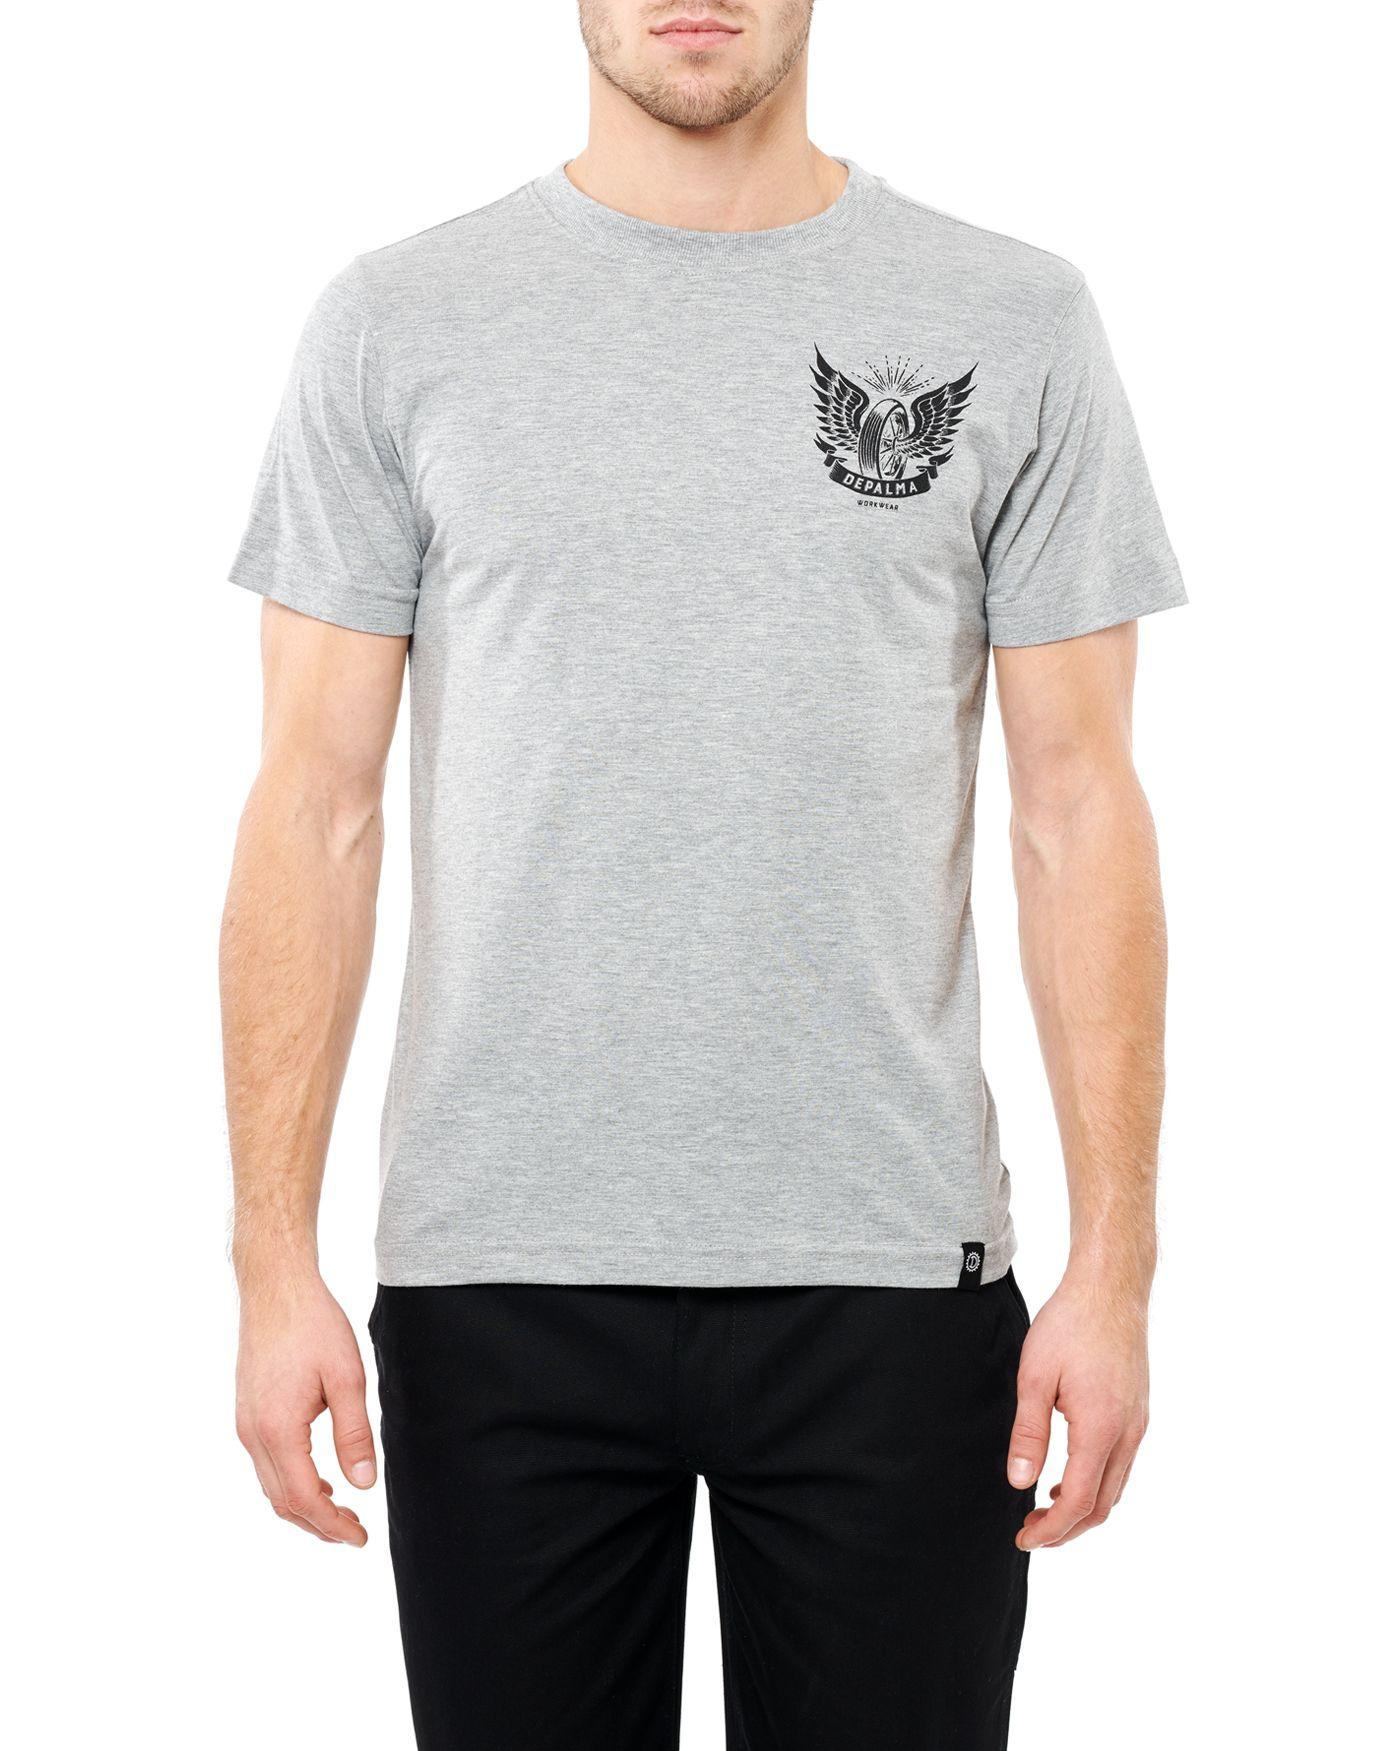 Photo of Thunder Road S/S T-shirt, Grey Melange